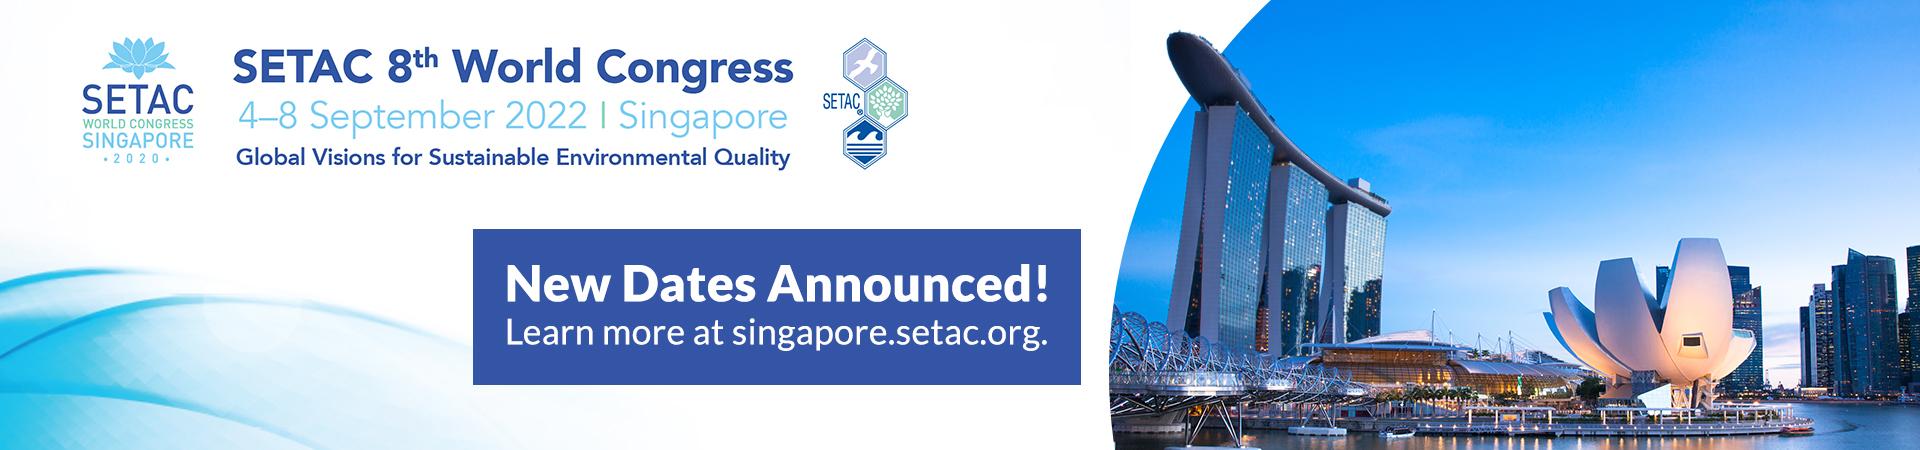 SETAC 8th World Congress